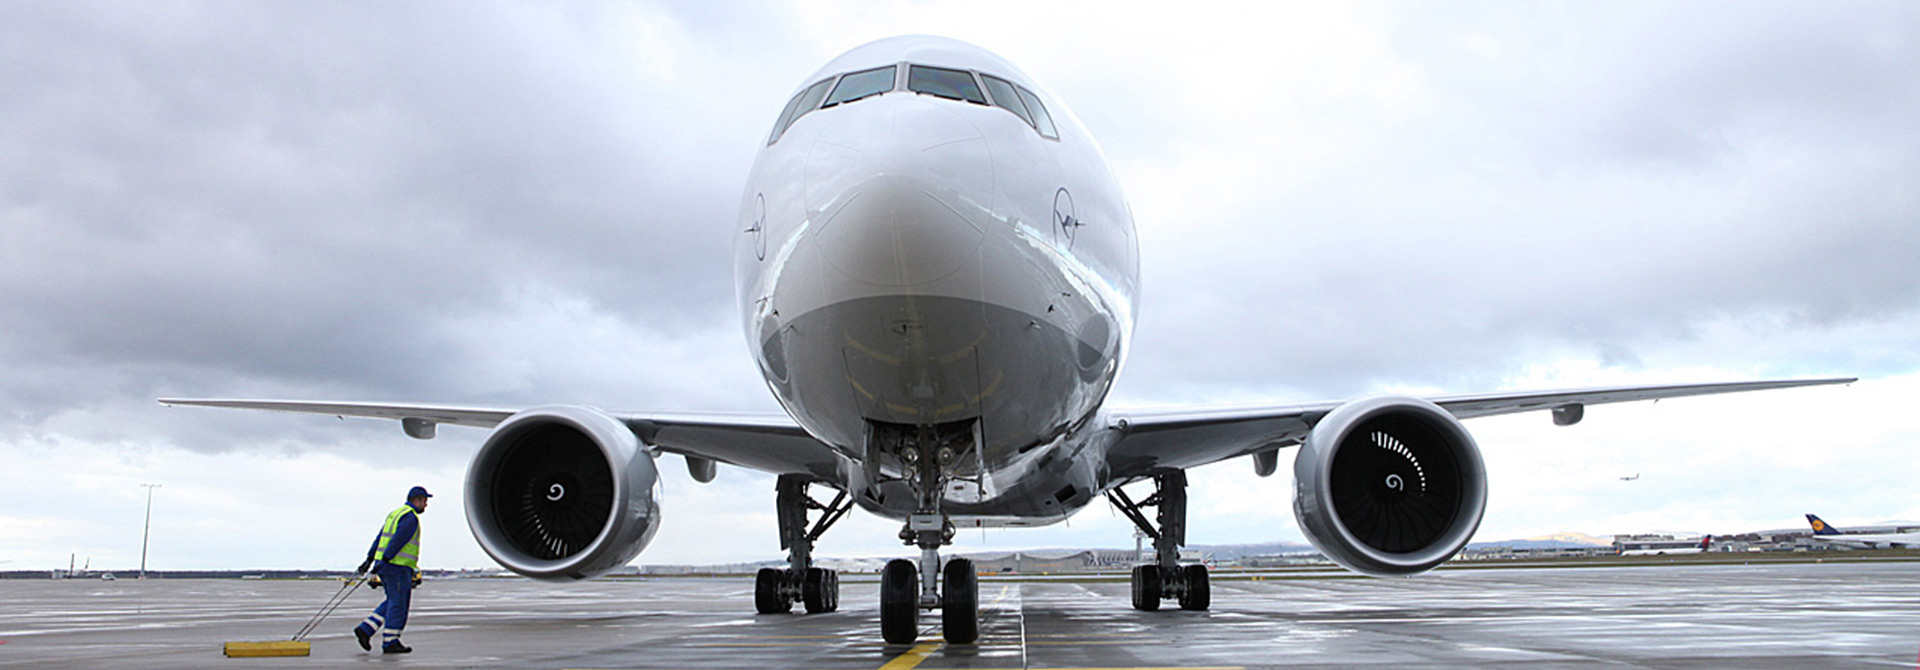 Flugzeug_2_grosse